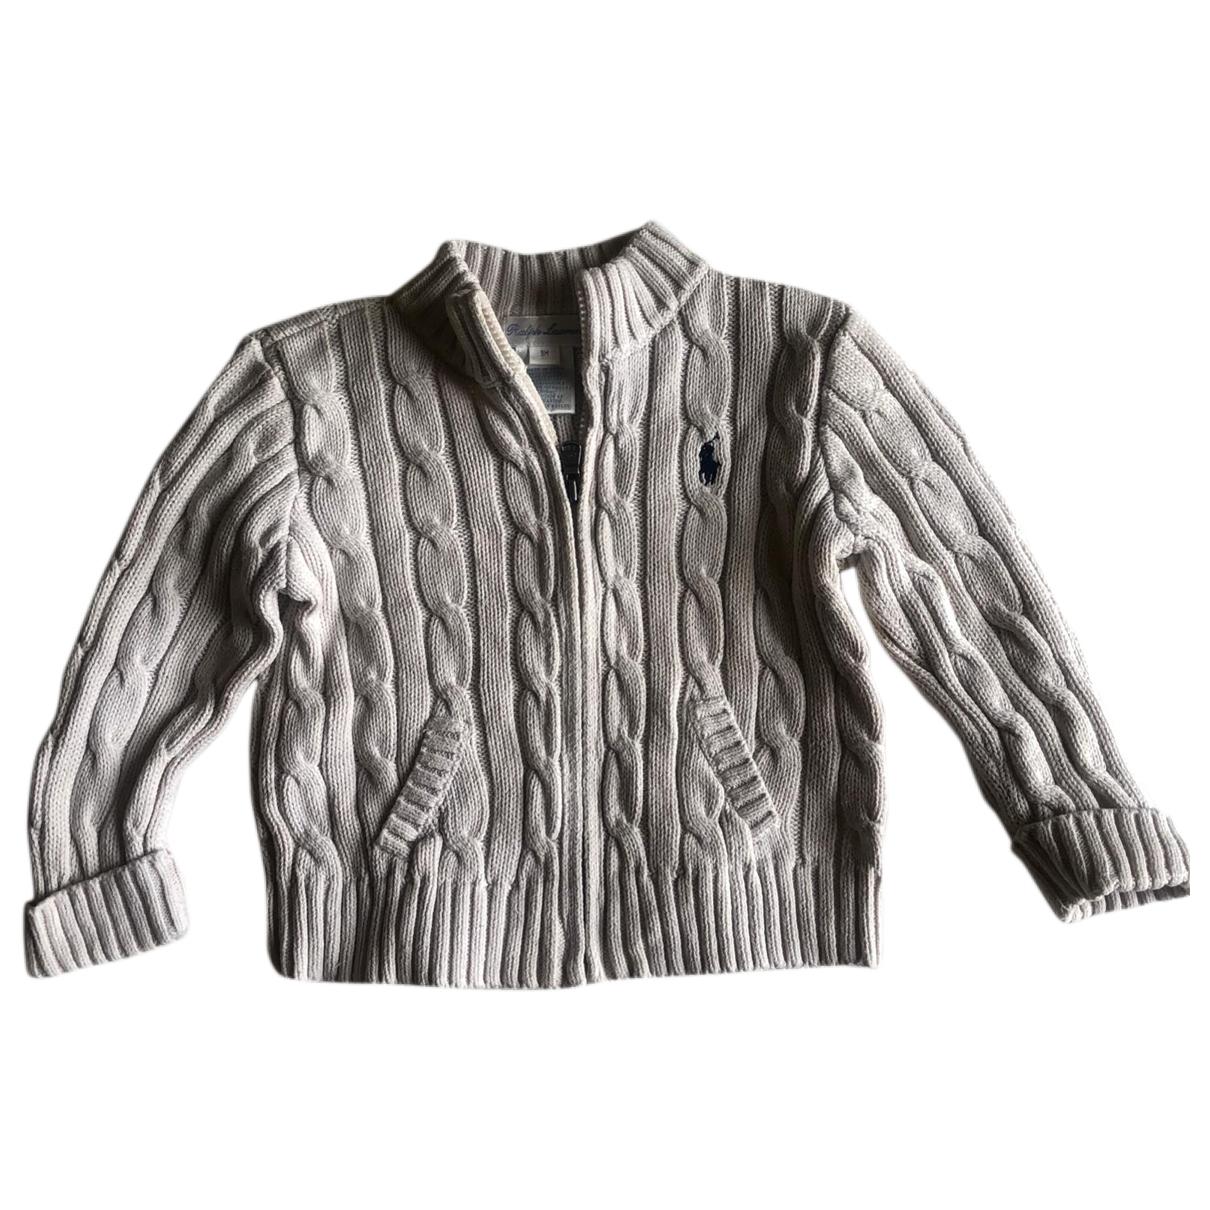 Polo Ralph Lauren \N Ecru Cotton Knitwear for Kids 9 months - until 28 inches UK